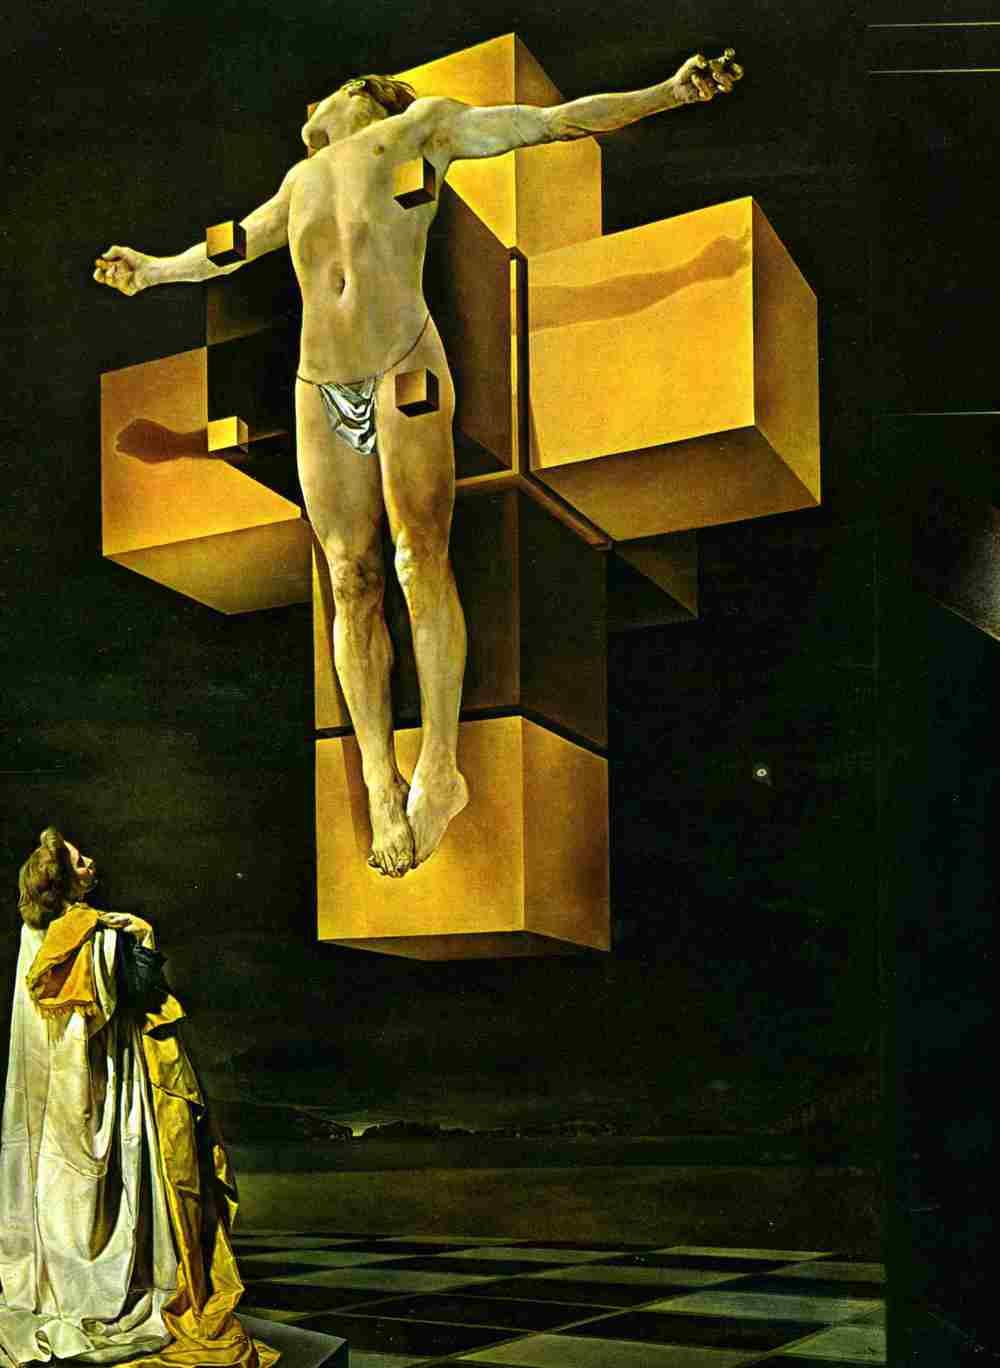 Crucifixion (Corpus Hypercubus) by Salvador Dali, 1954